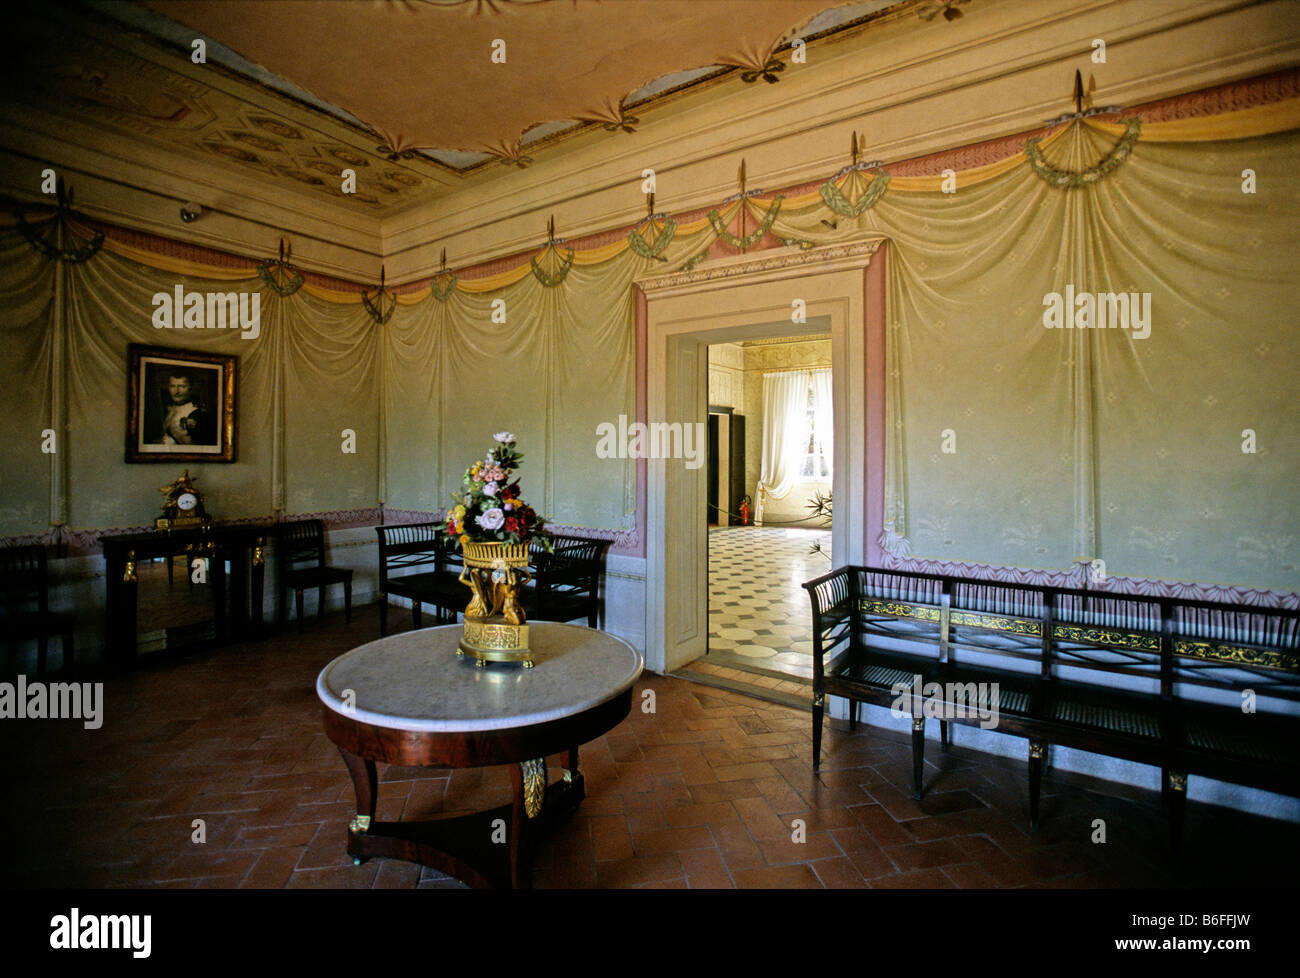 Sala Nodo d' Amore, Villa Napoleone, San Martino near Portoferraio, the island of Elba, Livorno Province, Tuscany, - Stock Image